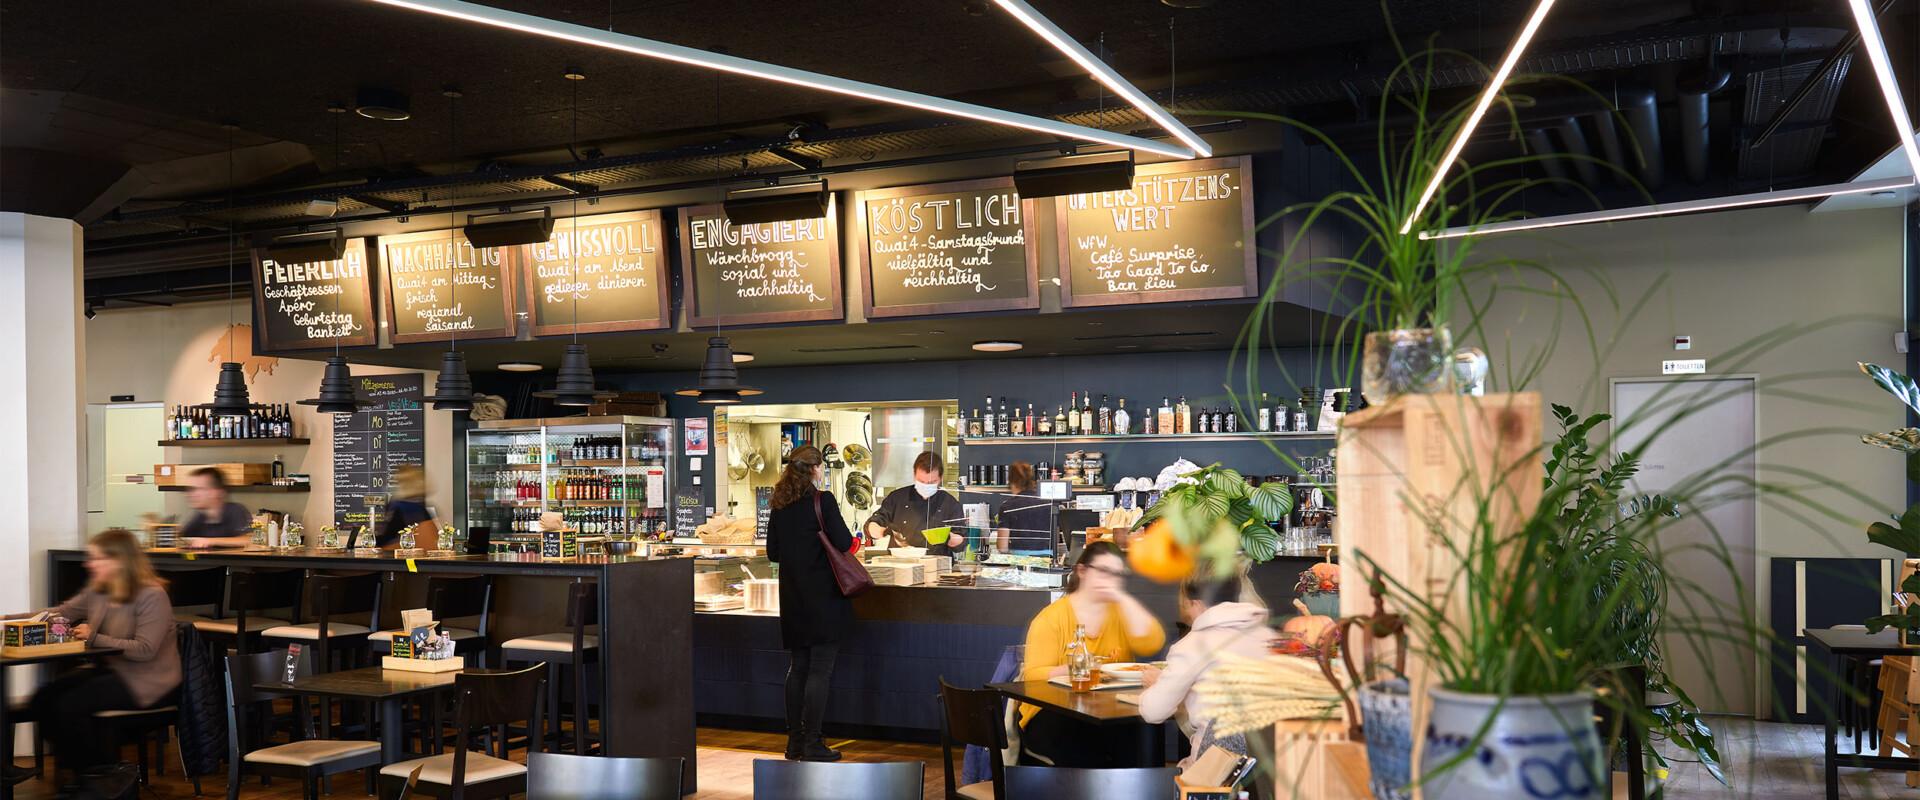 Wärchbrogg Restaurant Quai4